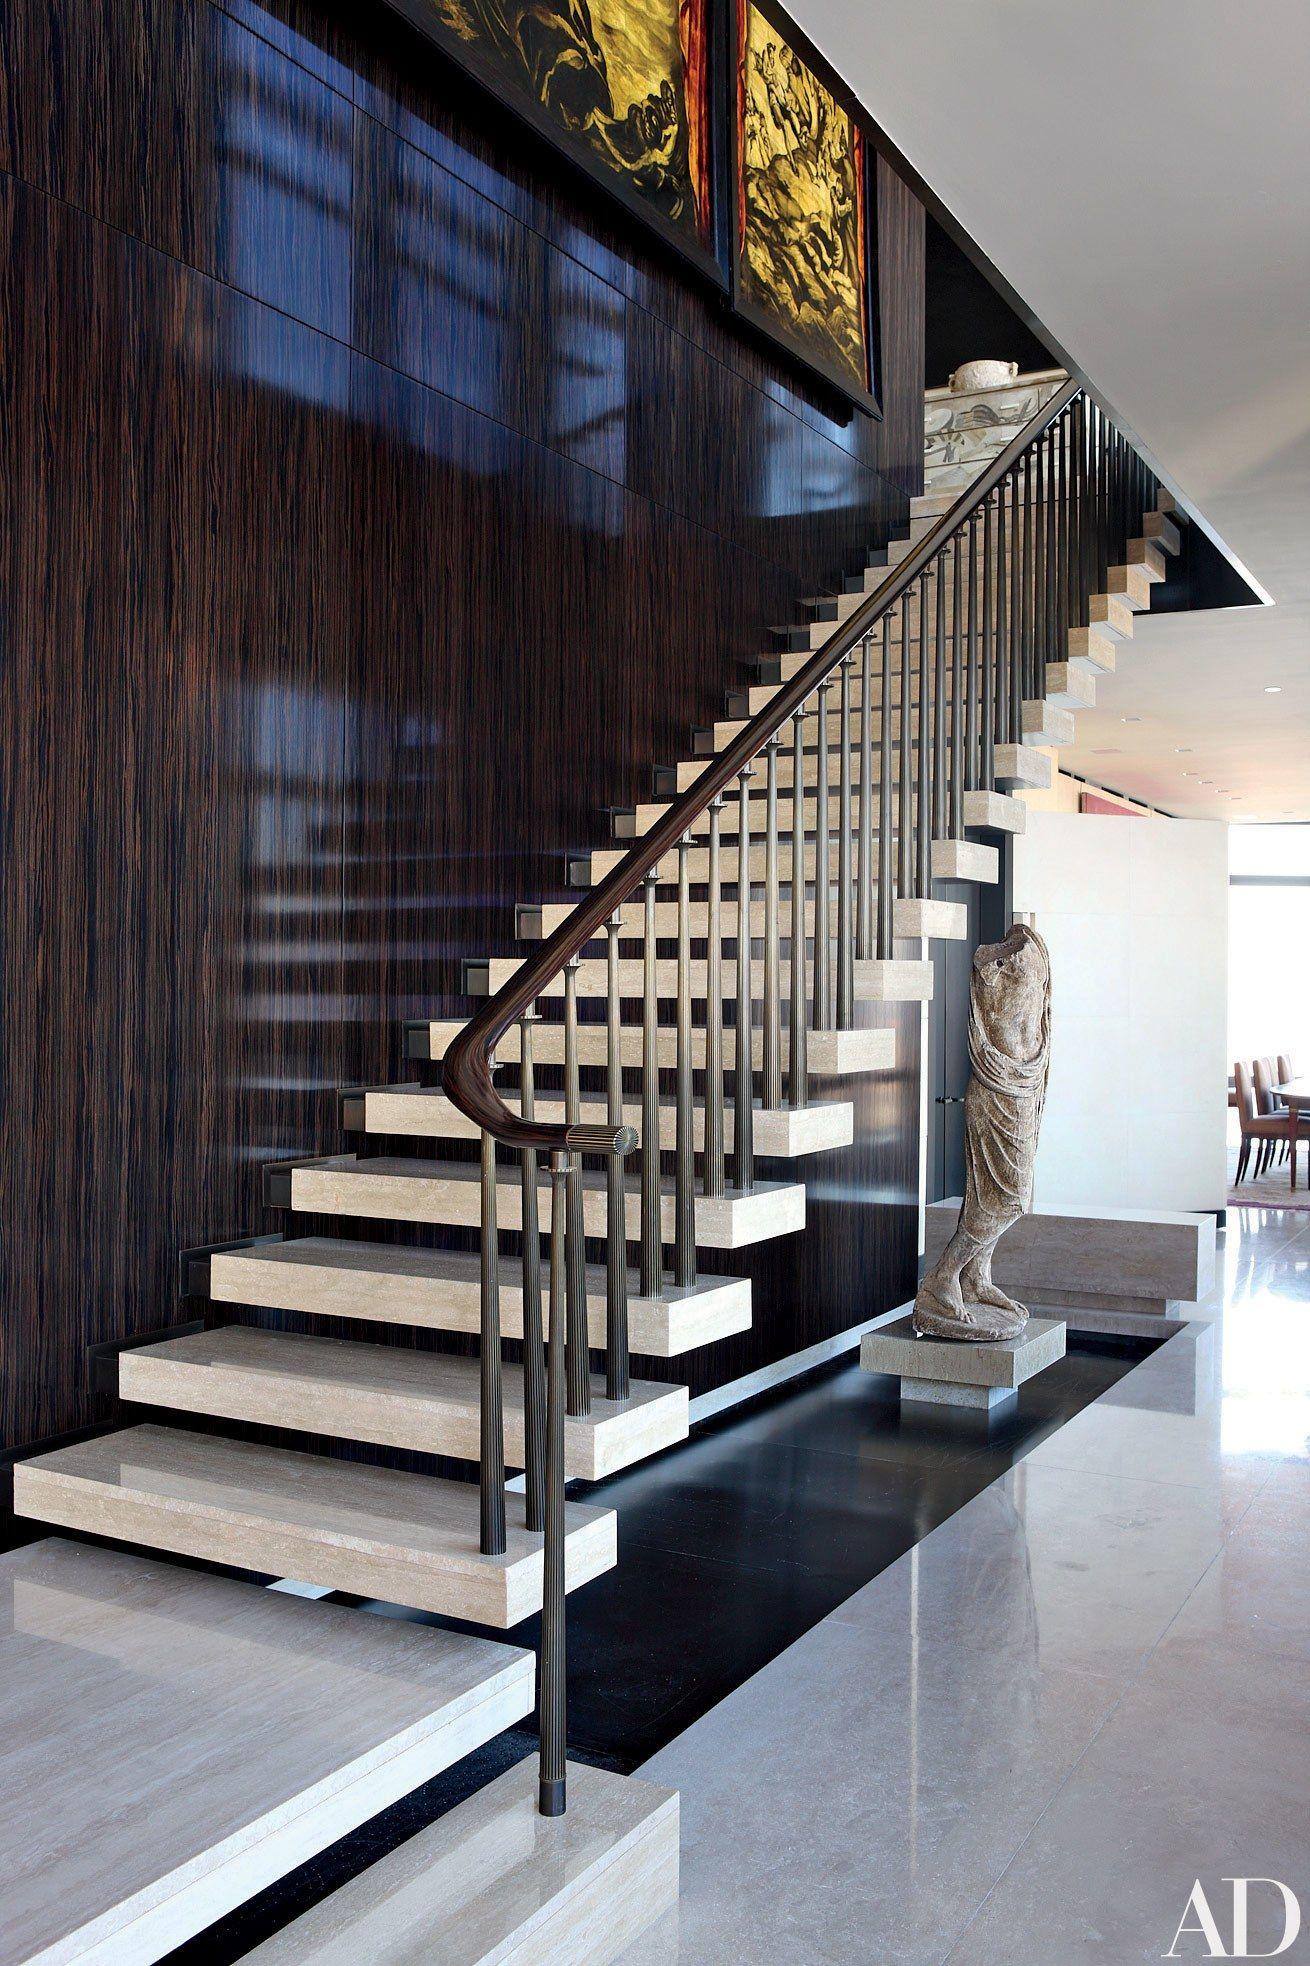 11 ways to decorate with travertine | travertine, architectural